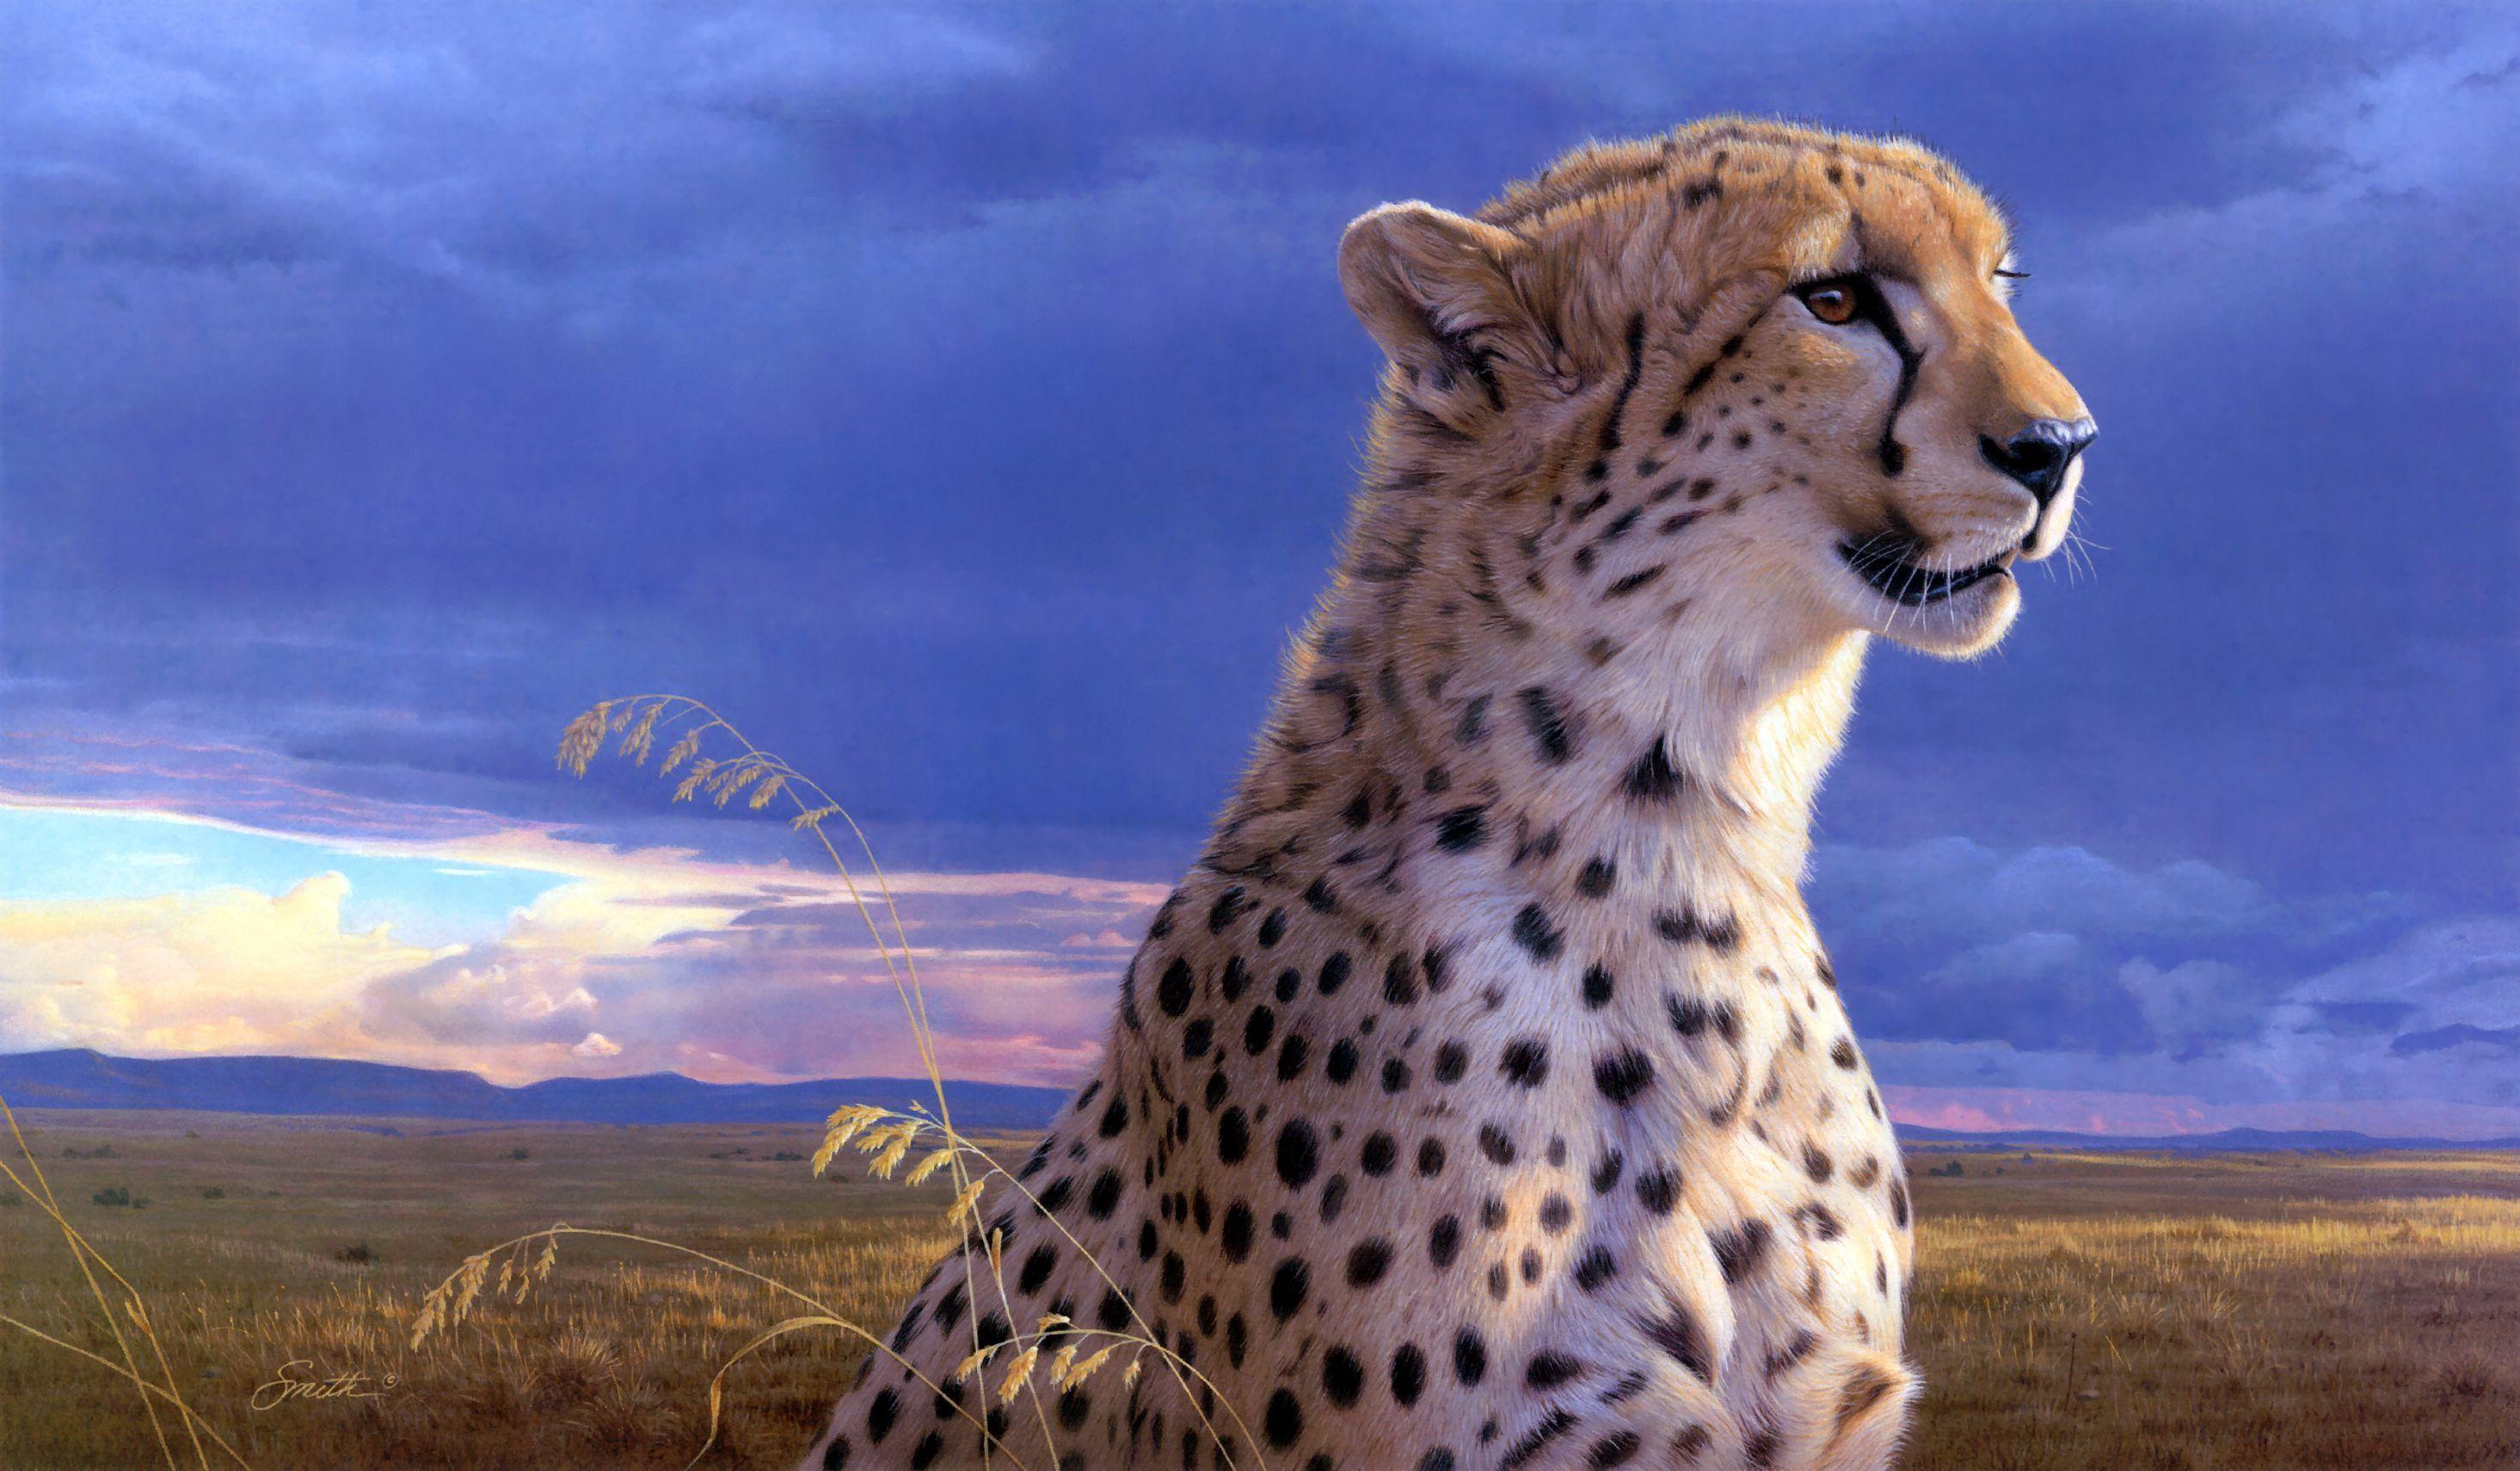 cheetah photos free HD Desktop Wallpapers 4k HD